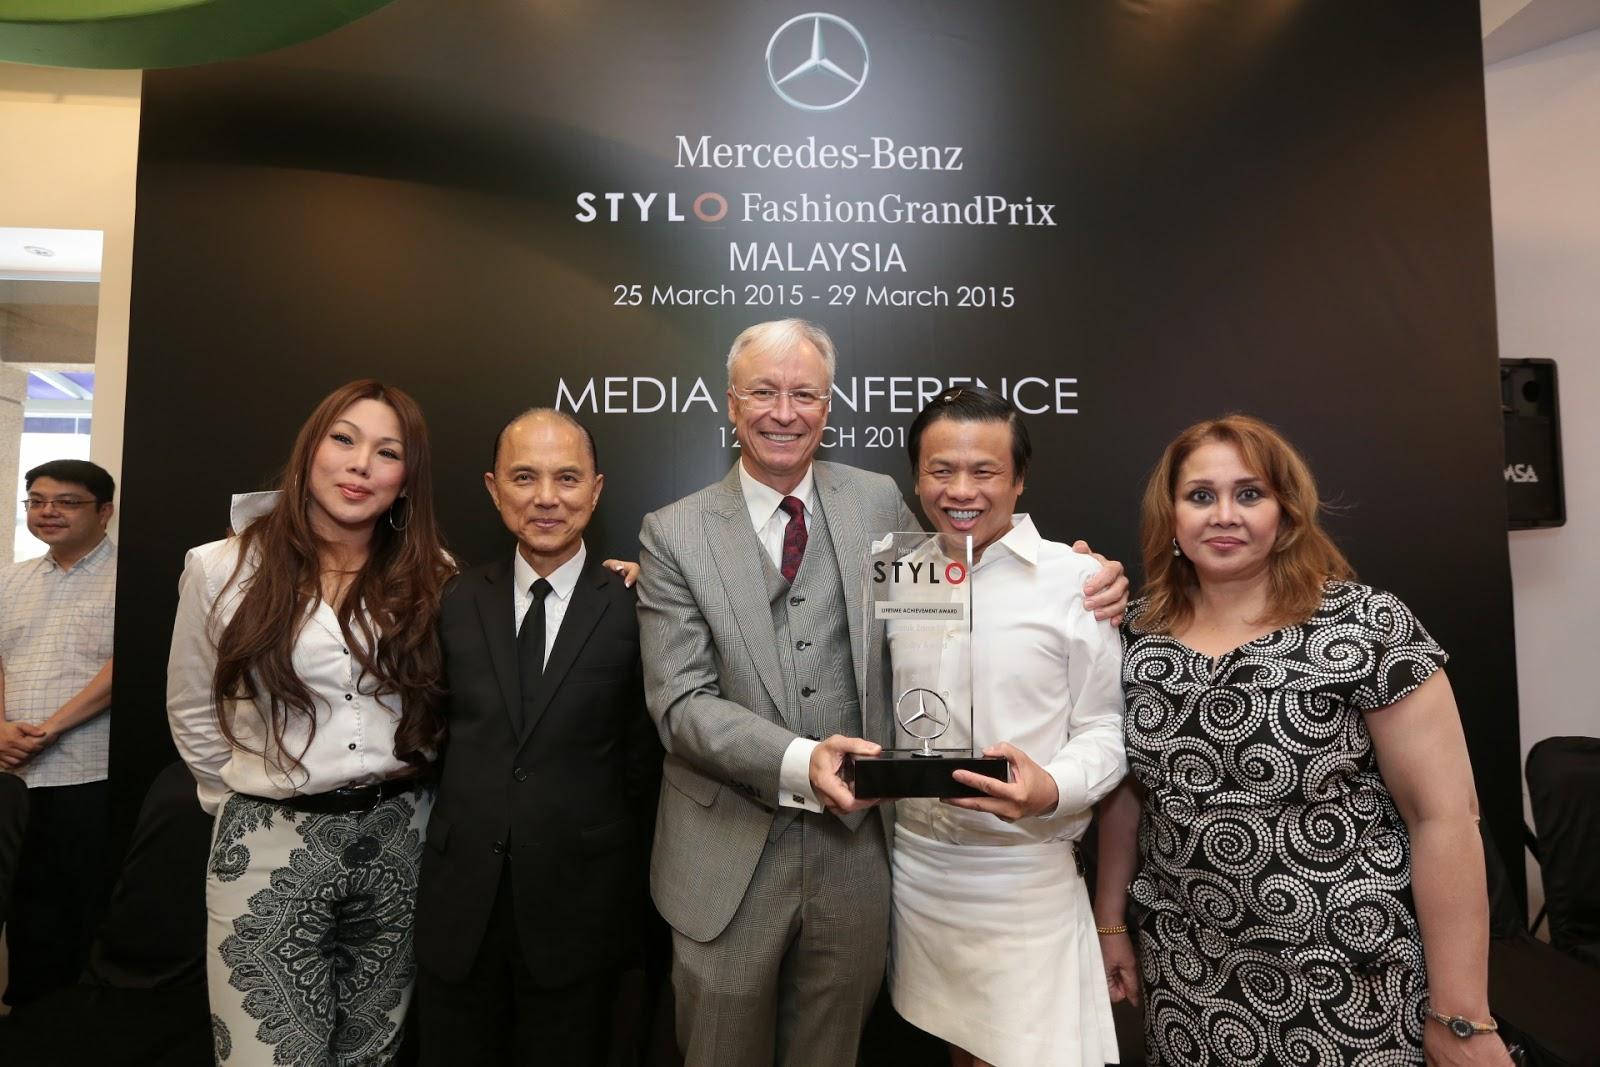 Kee Hua Chee Live Mercedes Benz Styloi Fashion Grand Prix Will Be